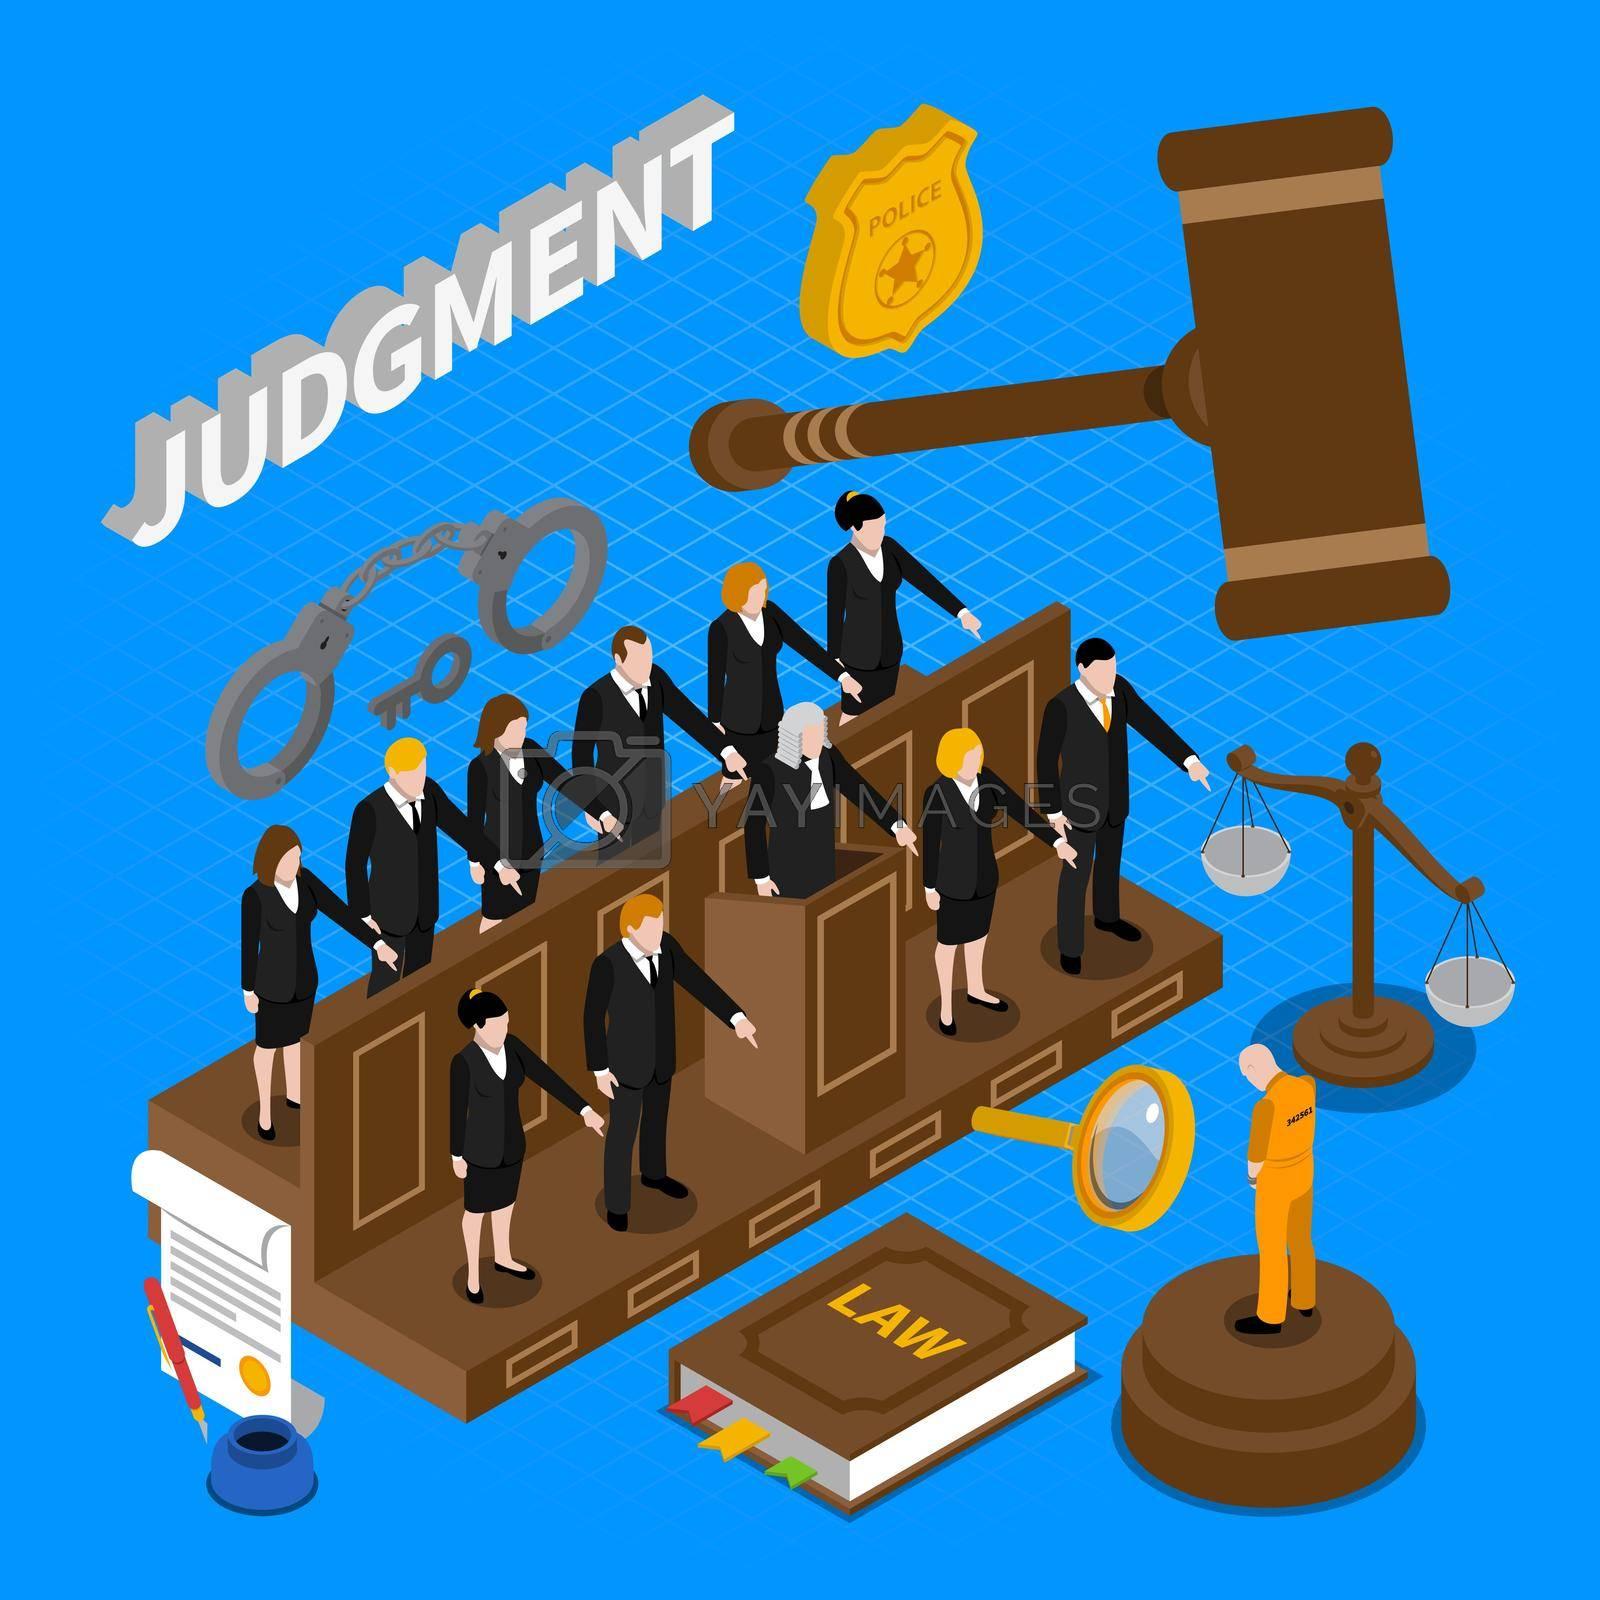 Royalty free image of Judgment People Illustration by mstjahanara